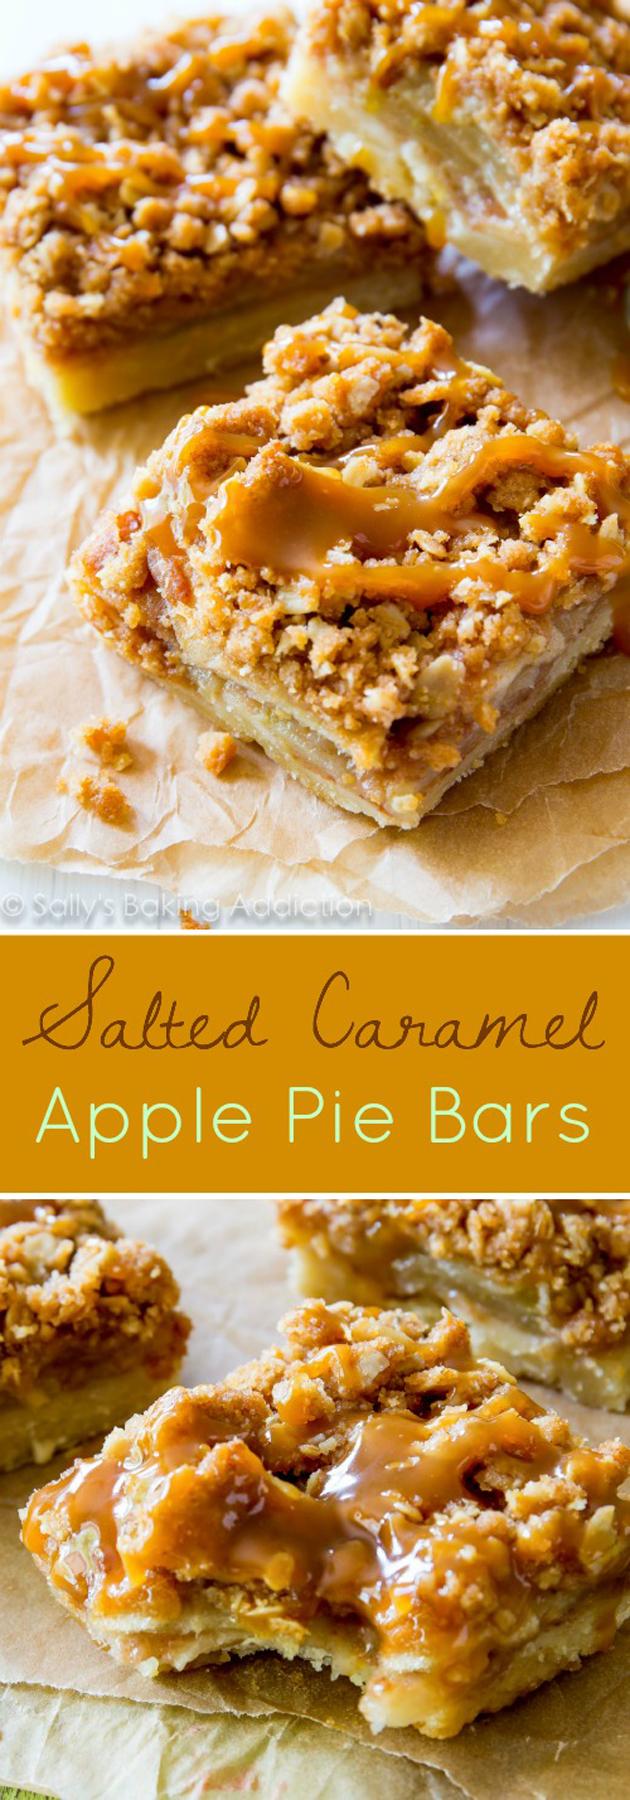 Salted-Caramel-Apple-Pie-Bars- sallys baking addiction